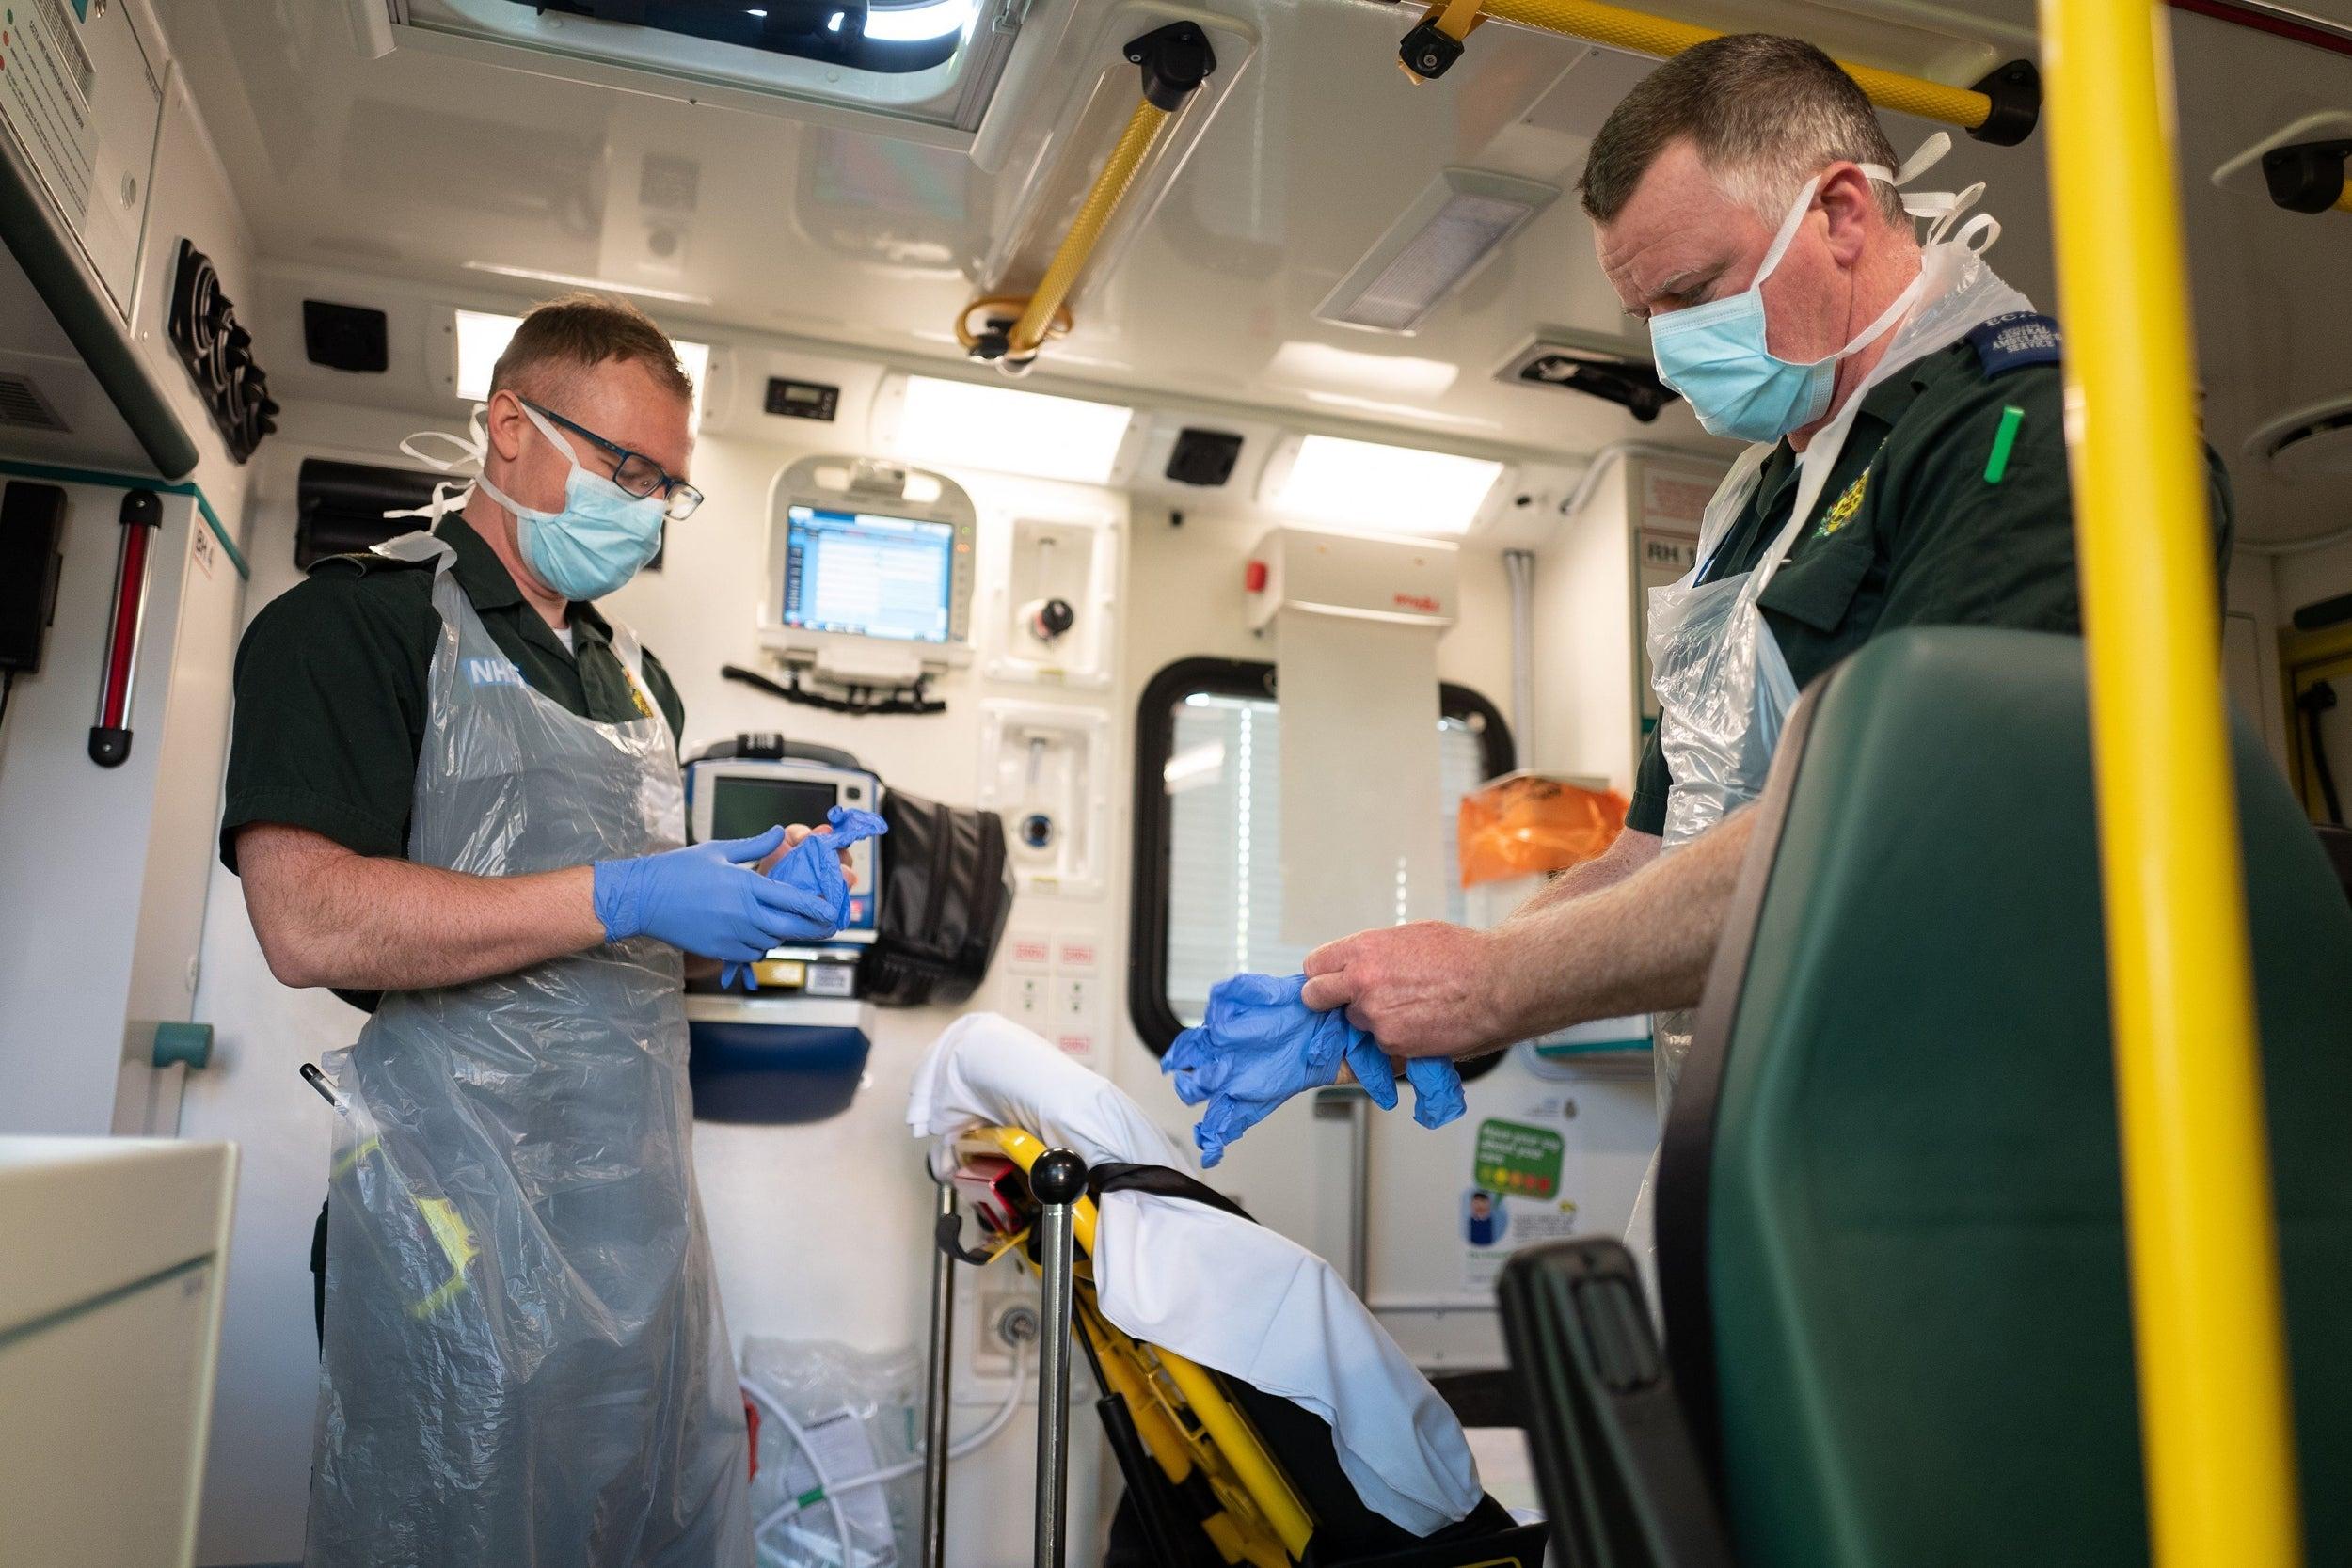 Coronavirus: Explaining the R value and what it means for the UK's lockdown thumbnail